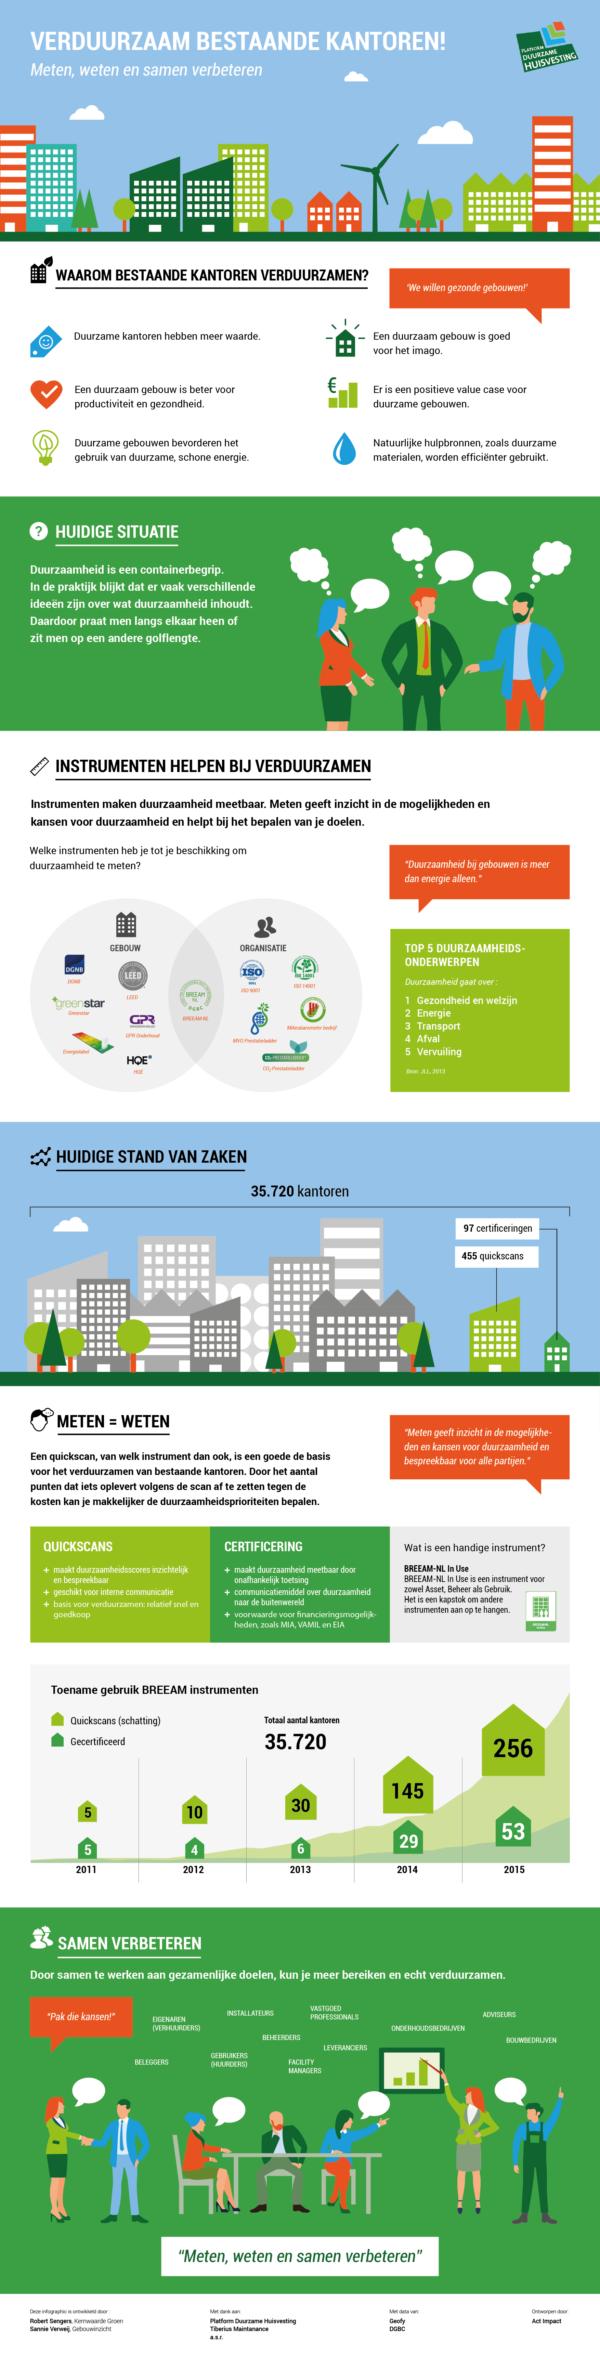 Verduurzaam bestaande kantoren-150dpi